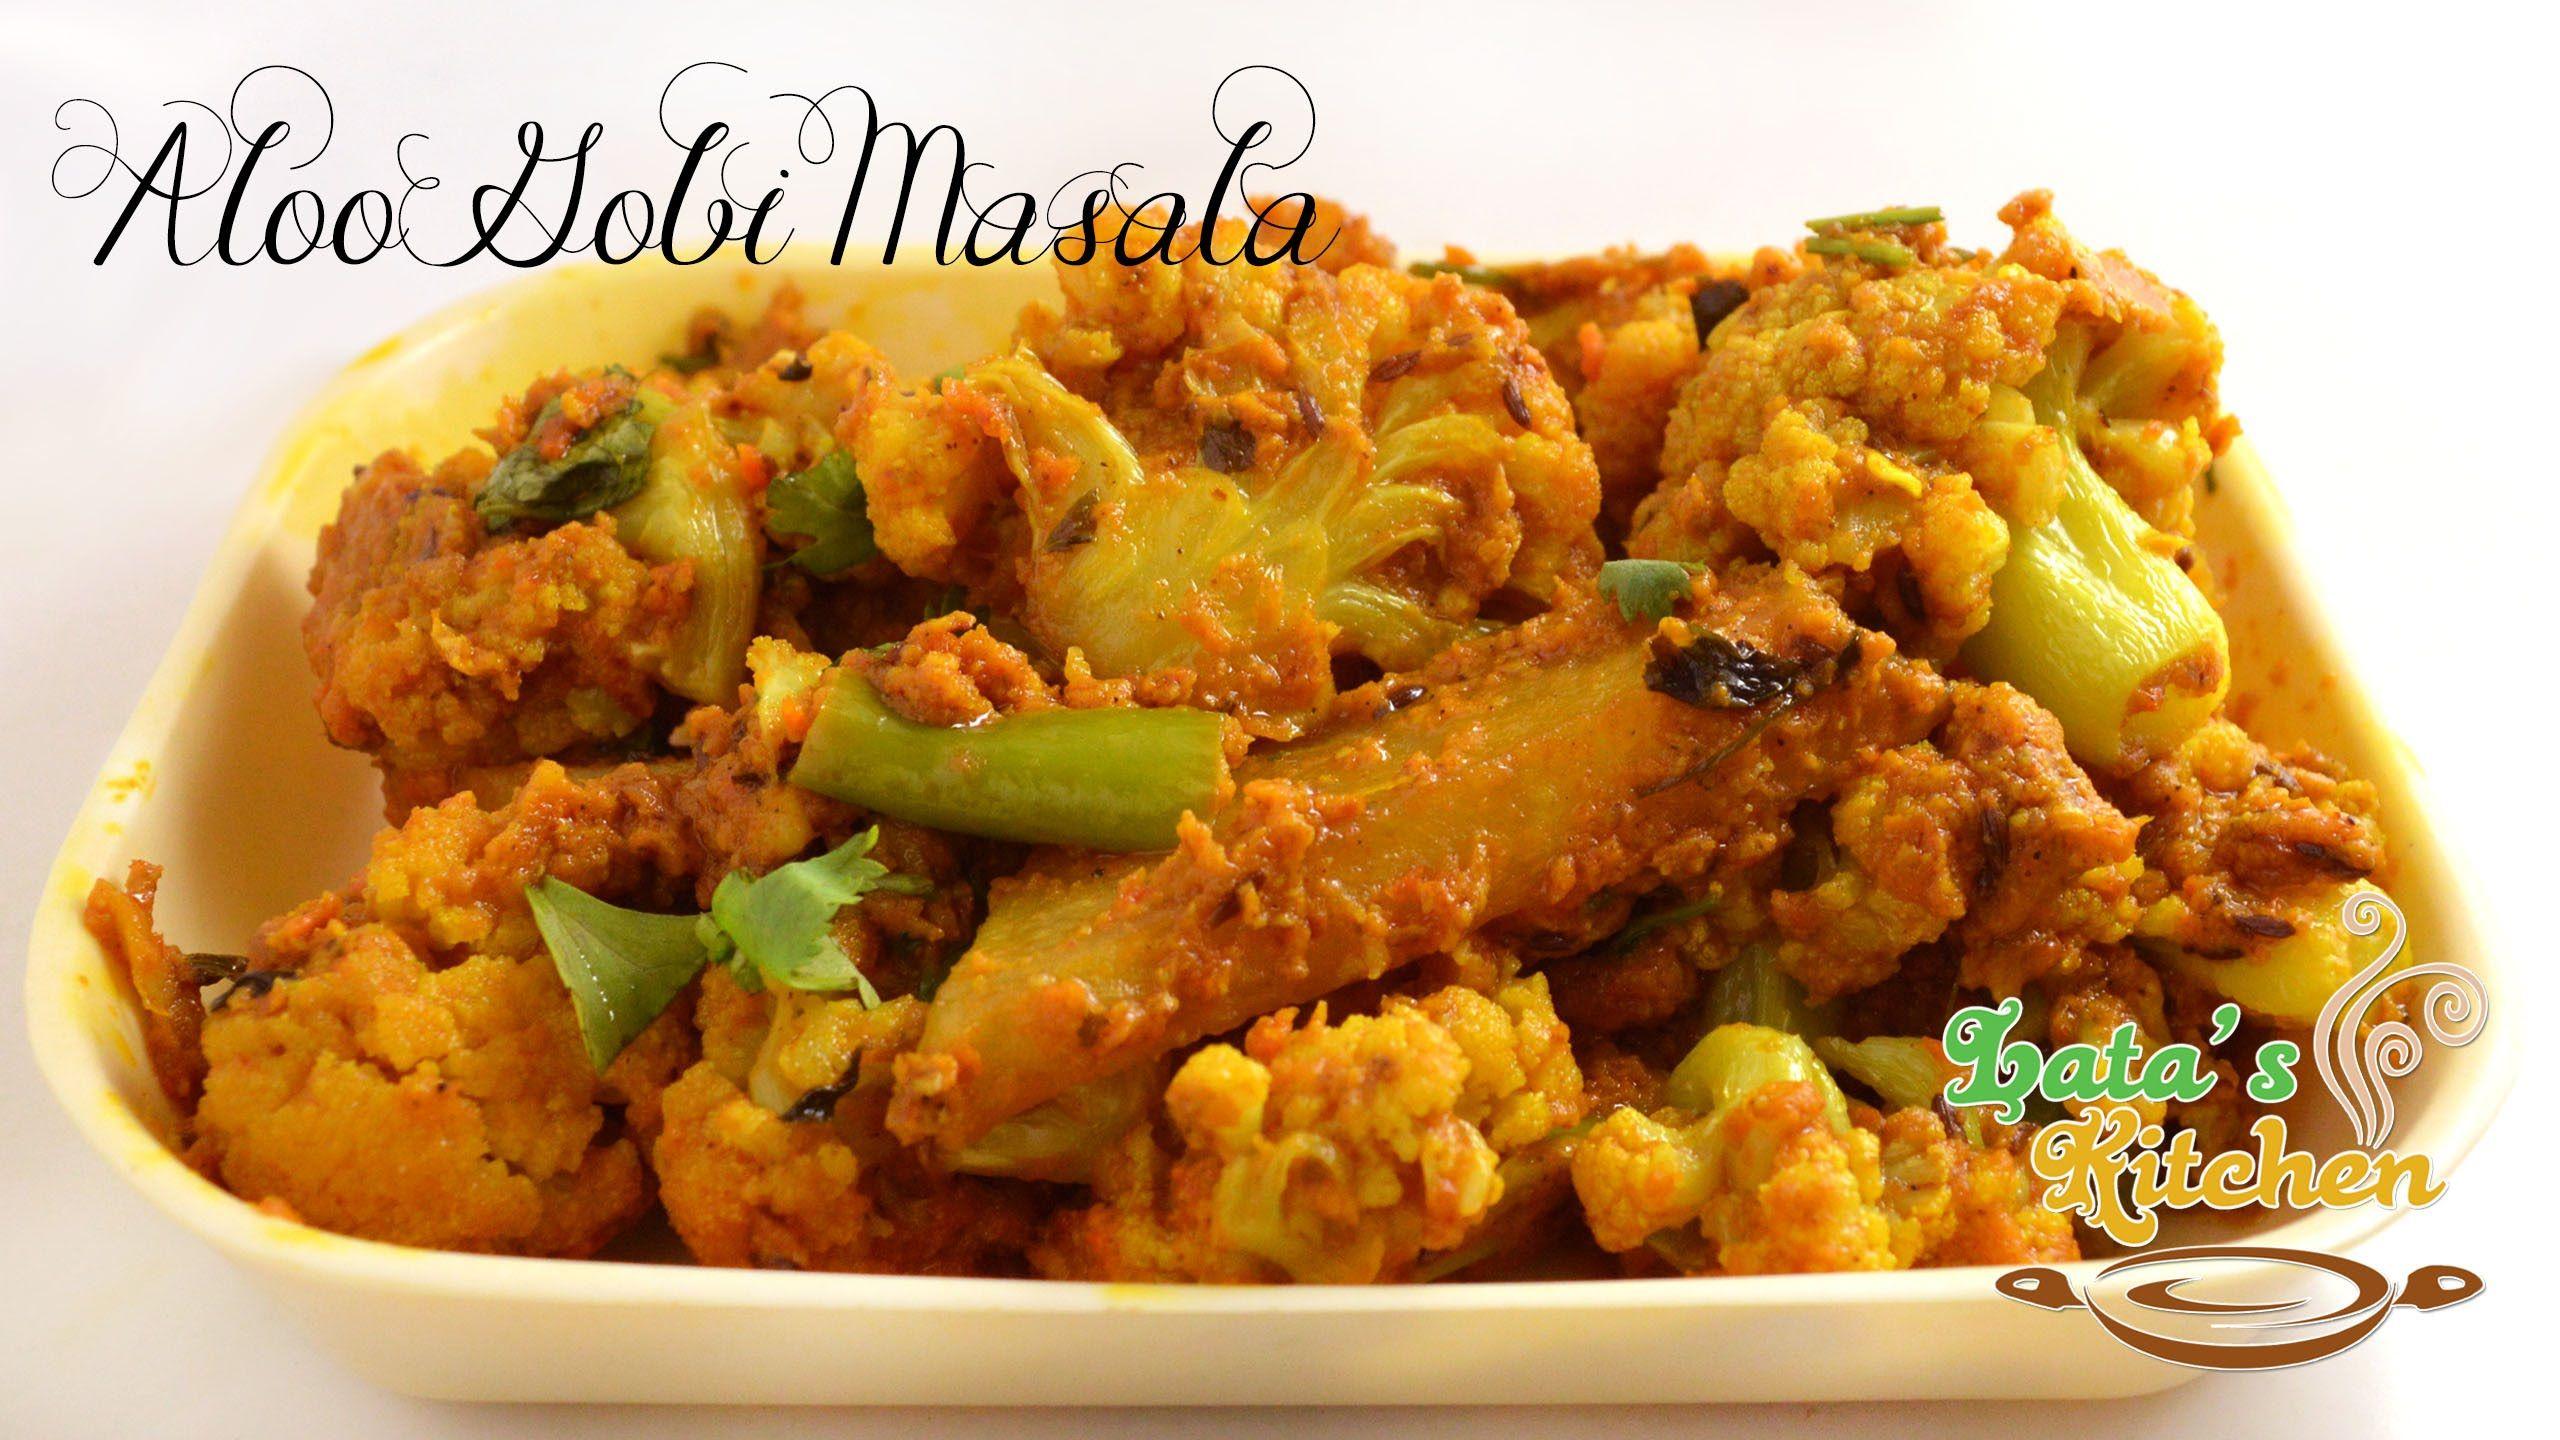 Aloo gobi masala recipe restaurant style indian vegetarian recipe aloo gobi masala recipe restaurant style indian vegetarian recipe in hindi with english subtitles forumfinder Gallery